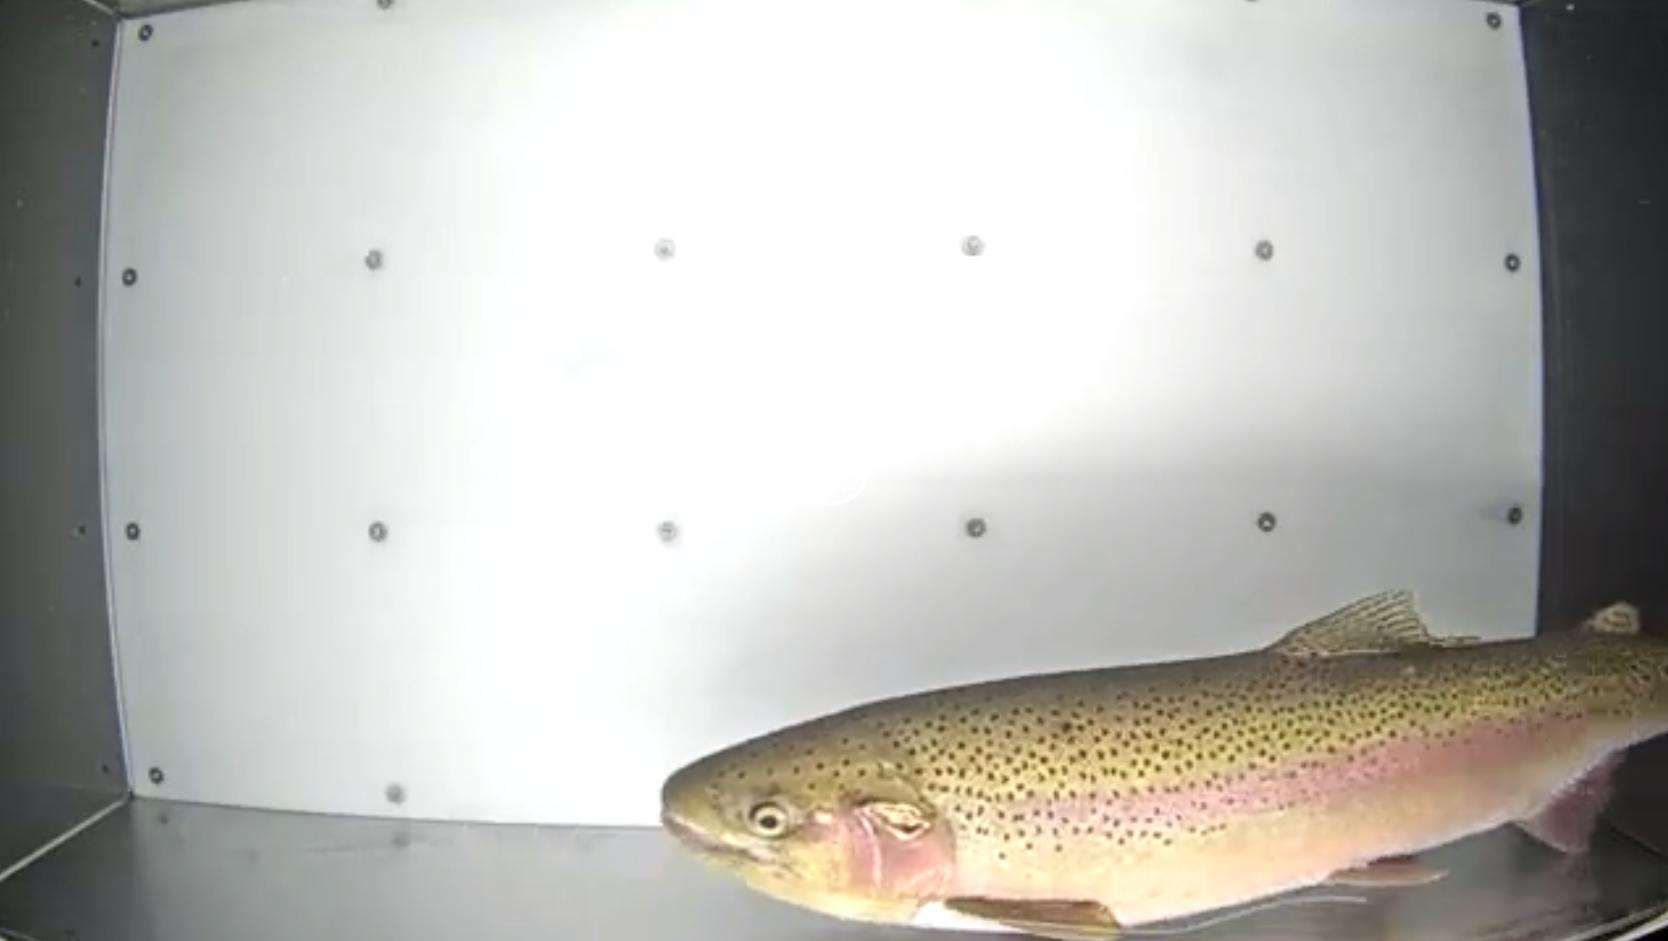 a salmon swimming